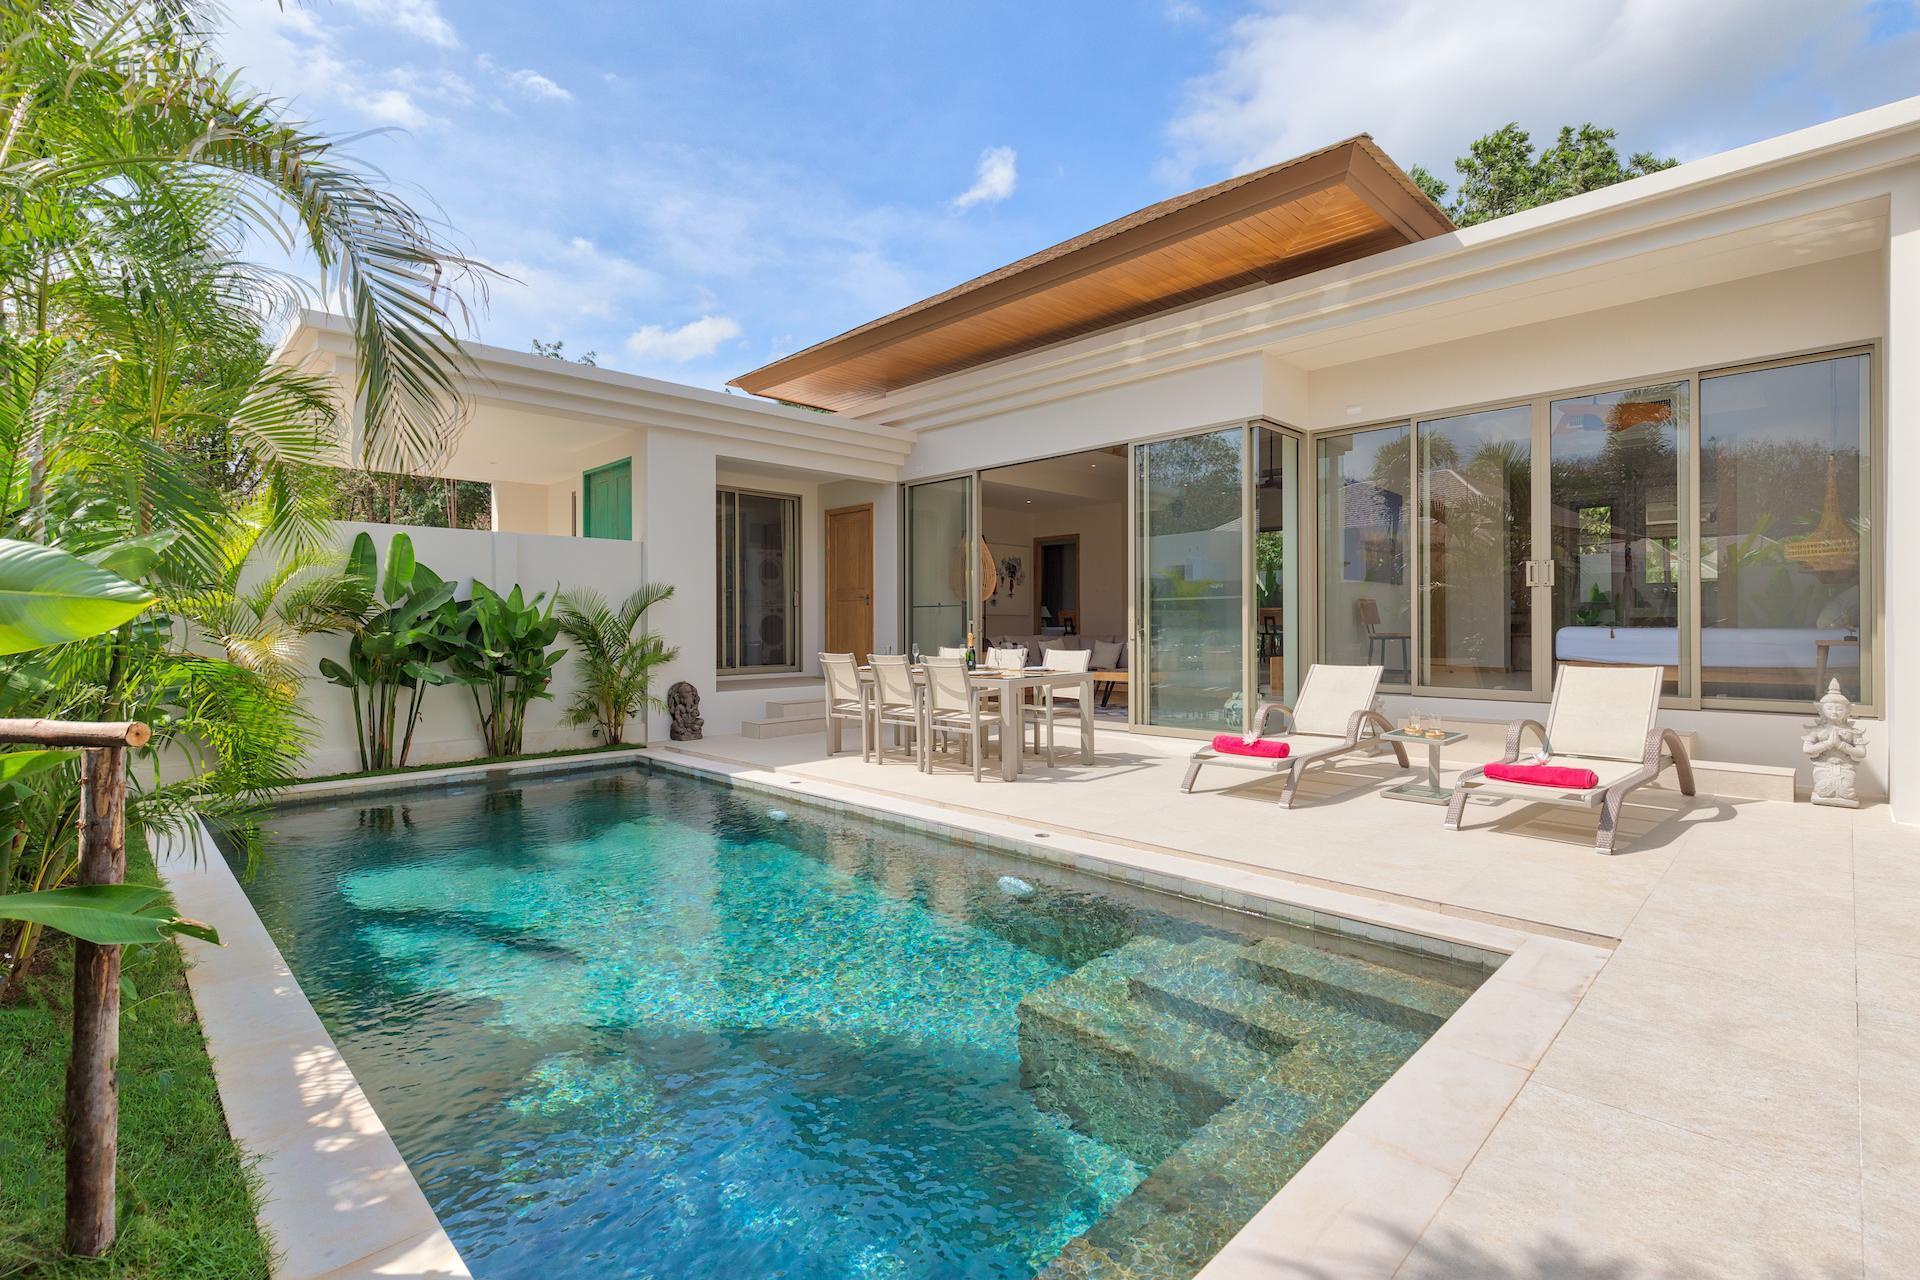 Dream Tropical Villa With 3 Bedrooms วิลลา 3 ห้องนอน 2 ห้องน้ำส่วนตัว ขนาด 309 ตร.ม. – บางเทา